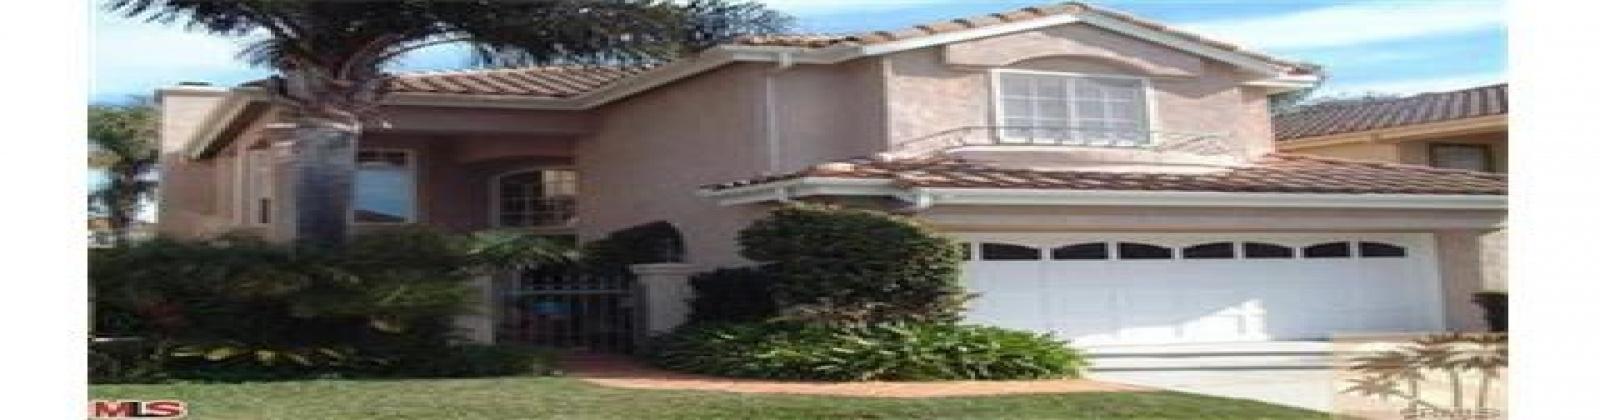 26 SAN RAPHAEL, California 92629, 3 Bedrooms Bedrooms, ,2 BathroomsBathrooms,Home,Leased,26 ,1317